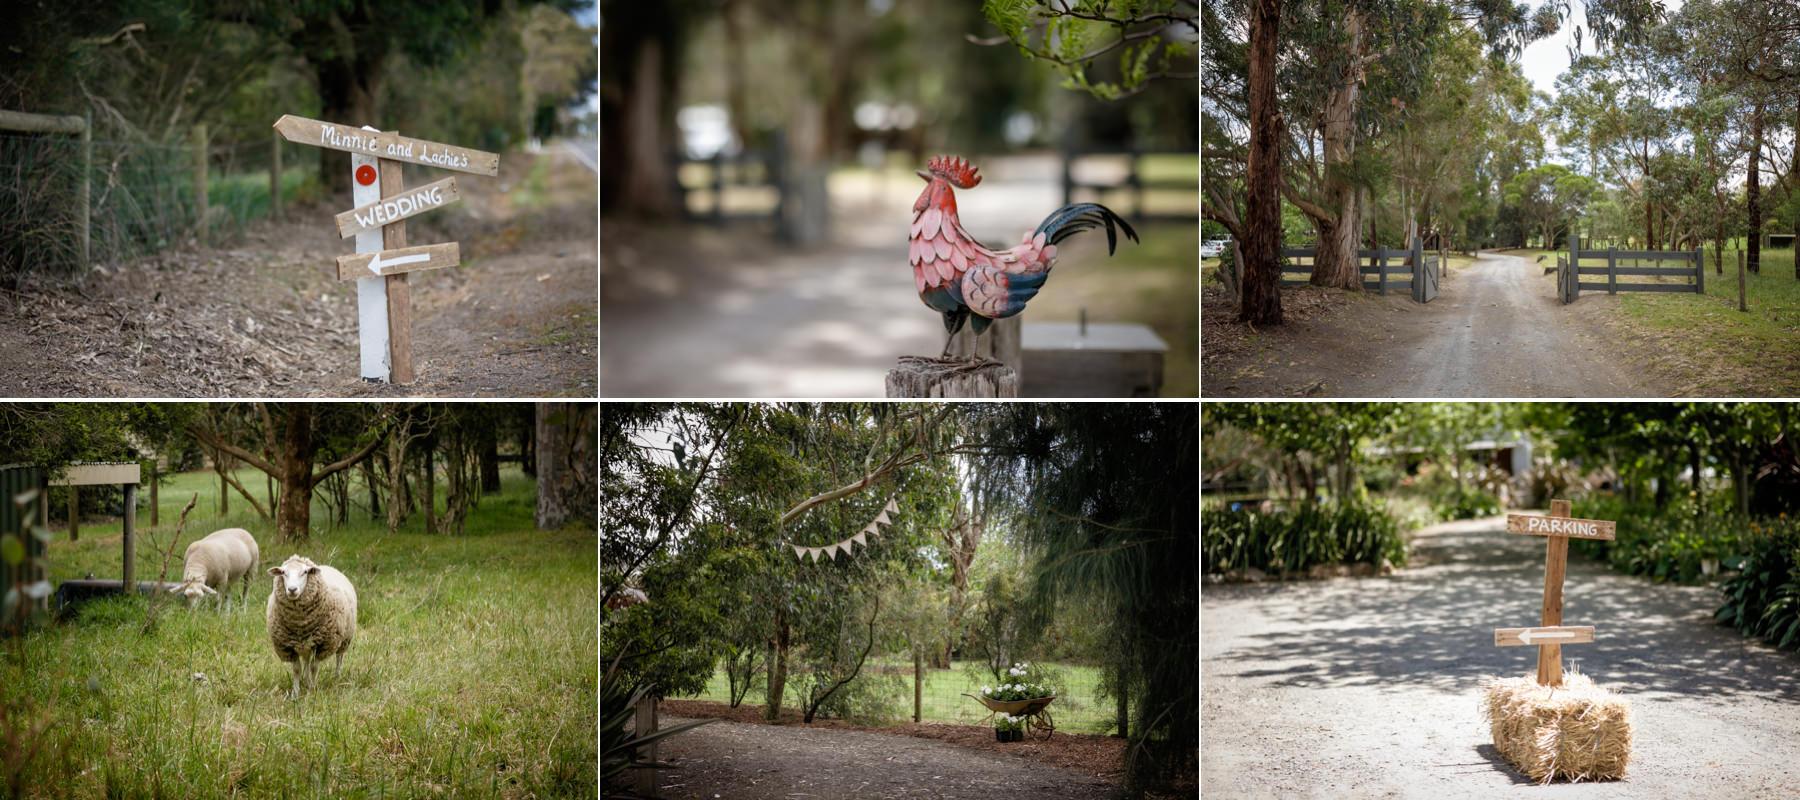 026 Minnie and Lachie Blog-001.jpg